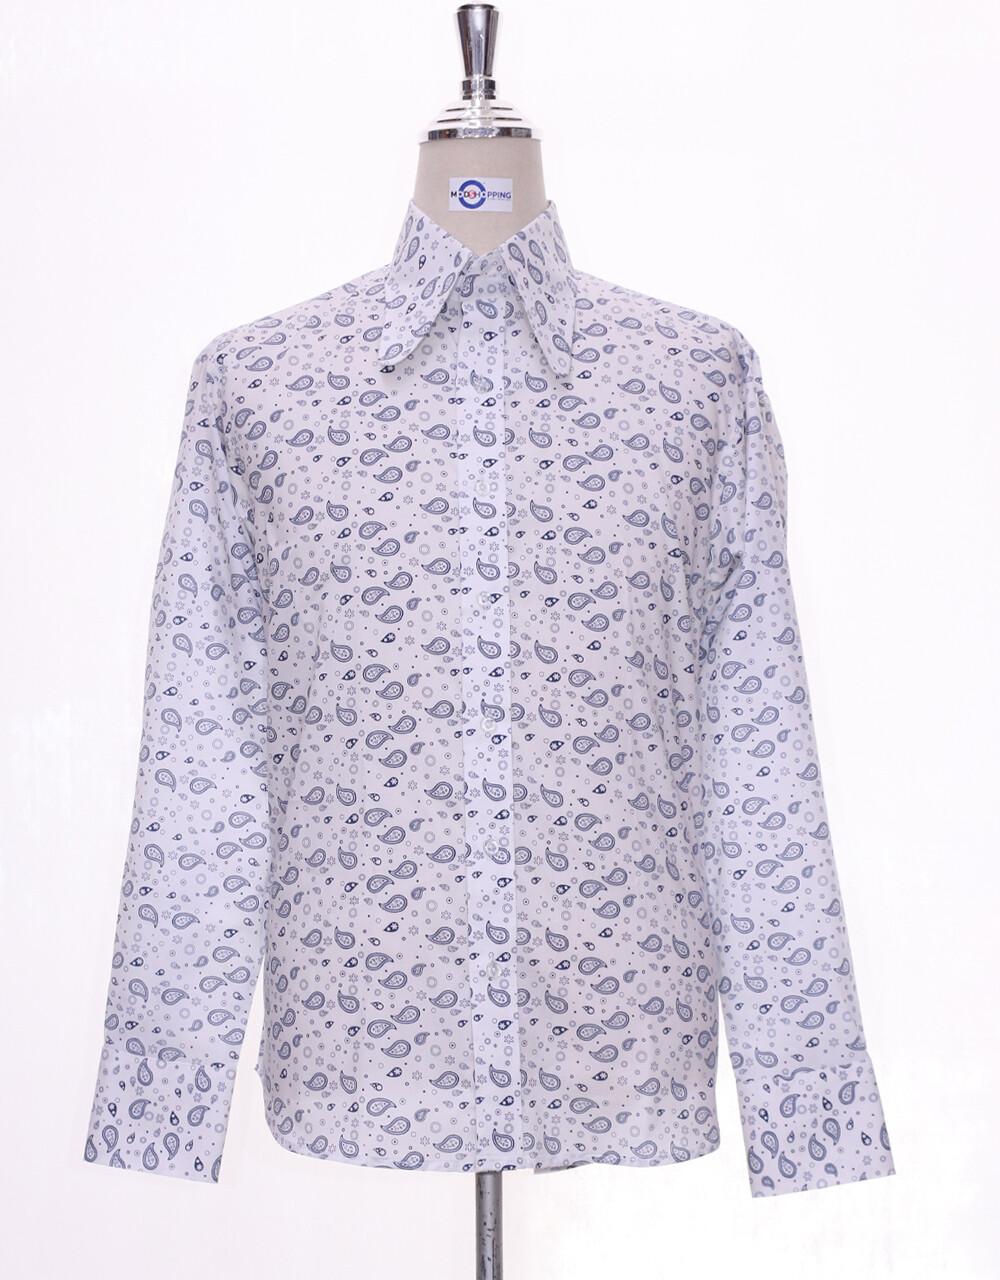 Hight Collar Shirt    White Small Paisley Shirt